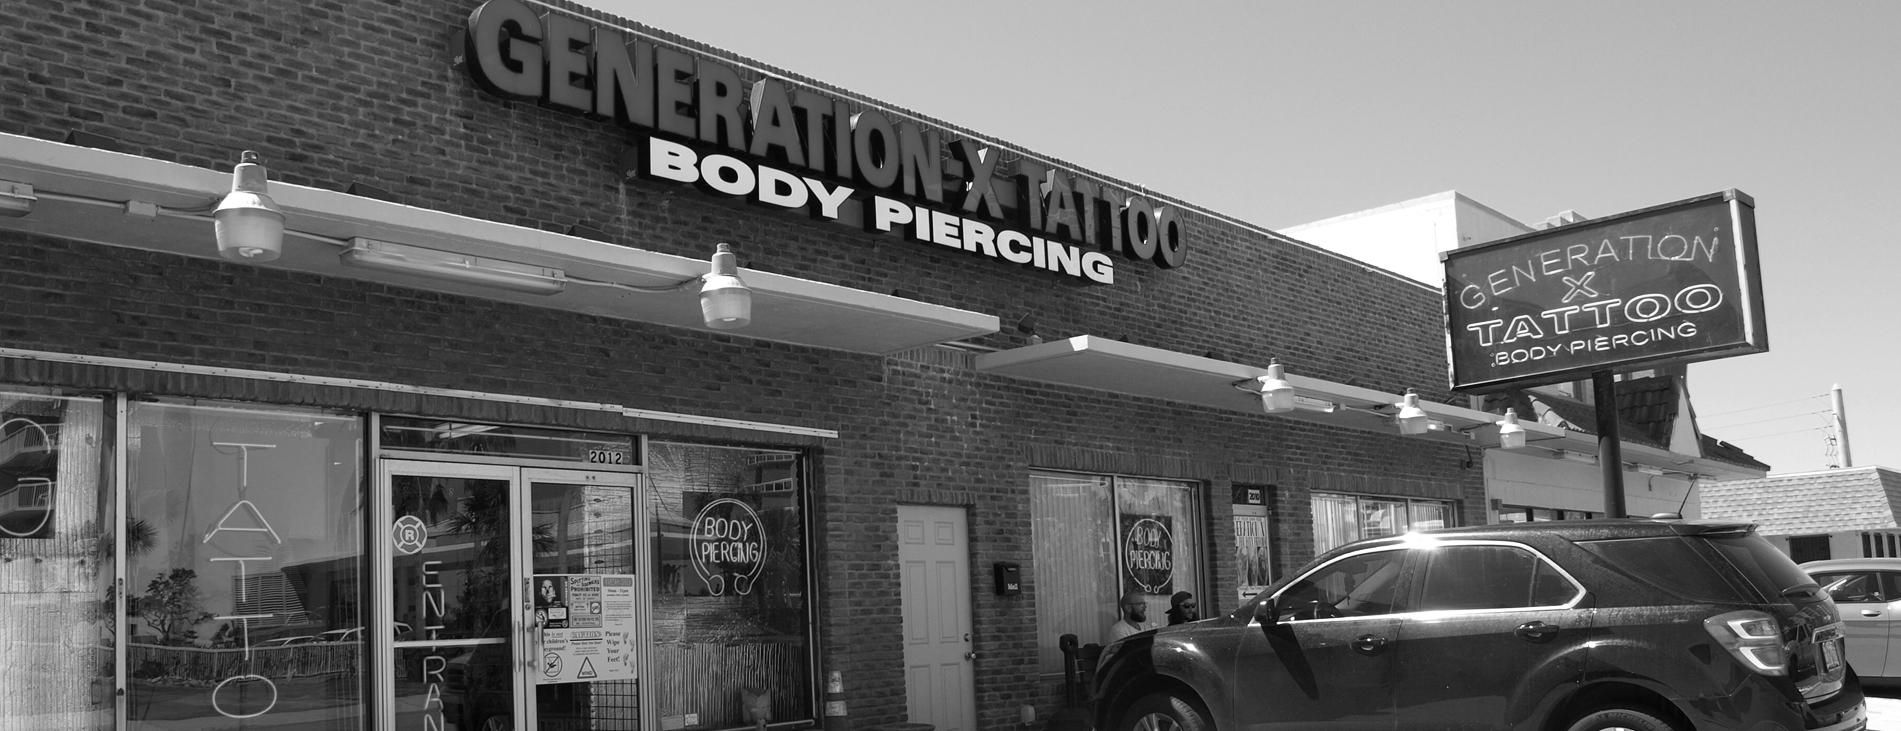 Welcome to Generation X Tattoo: The Original Daytona Beach Tattoo Shop